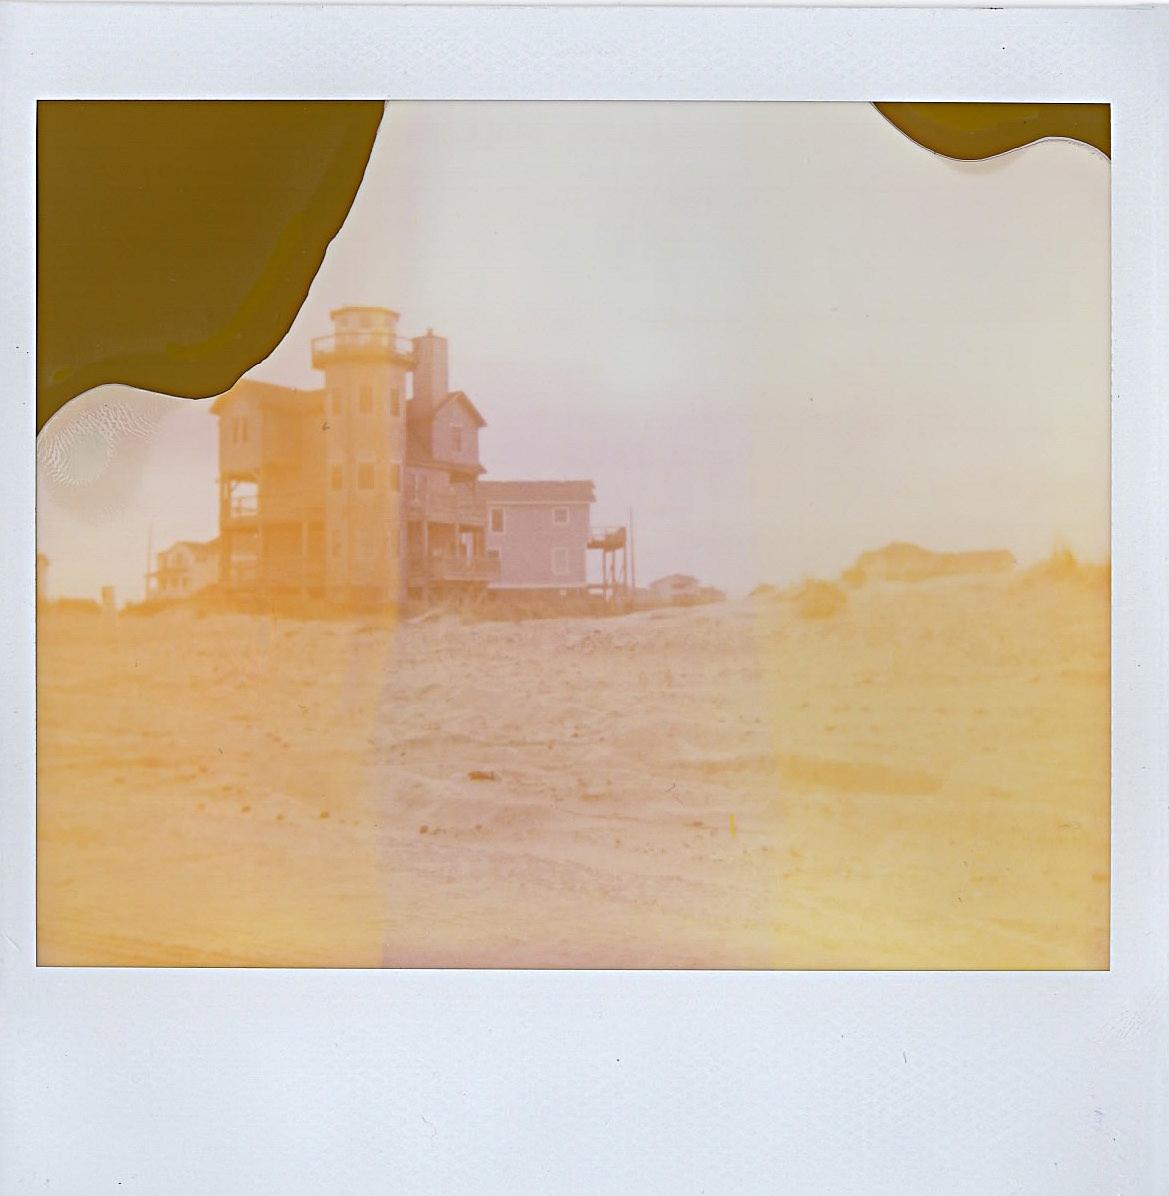 Dreamy beach house in Outer Banks, North Carolina -- January 2017 -- Expired Polaroid Spectra